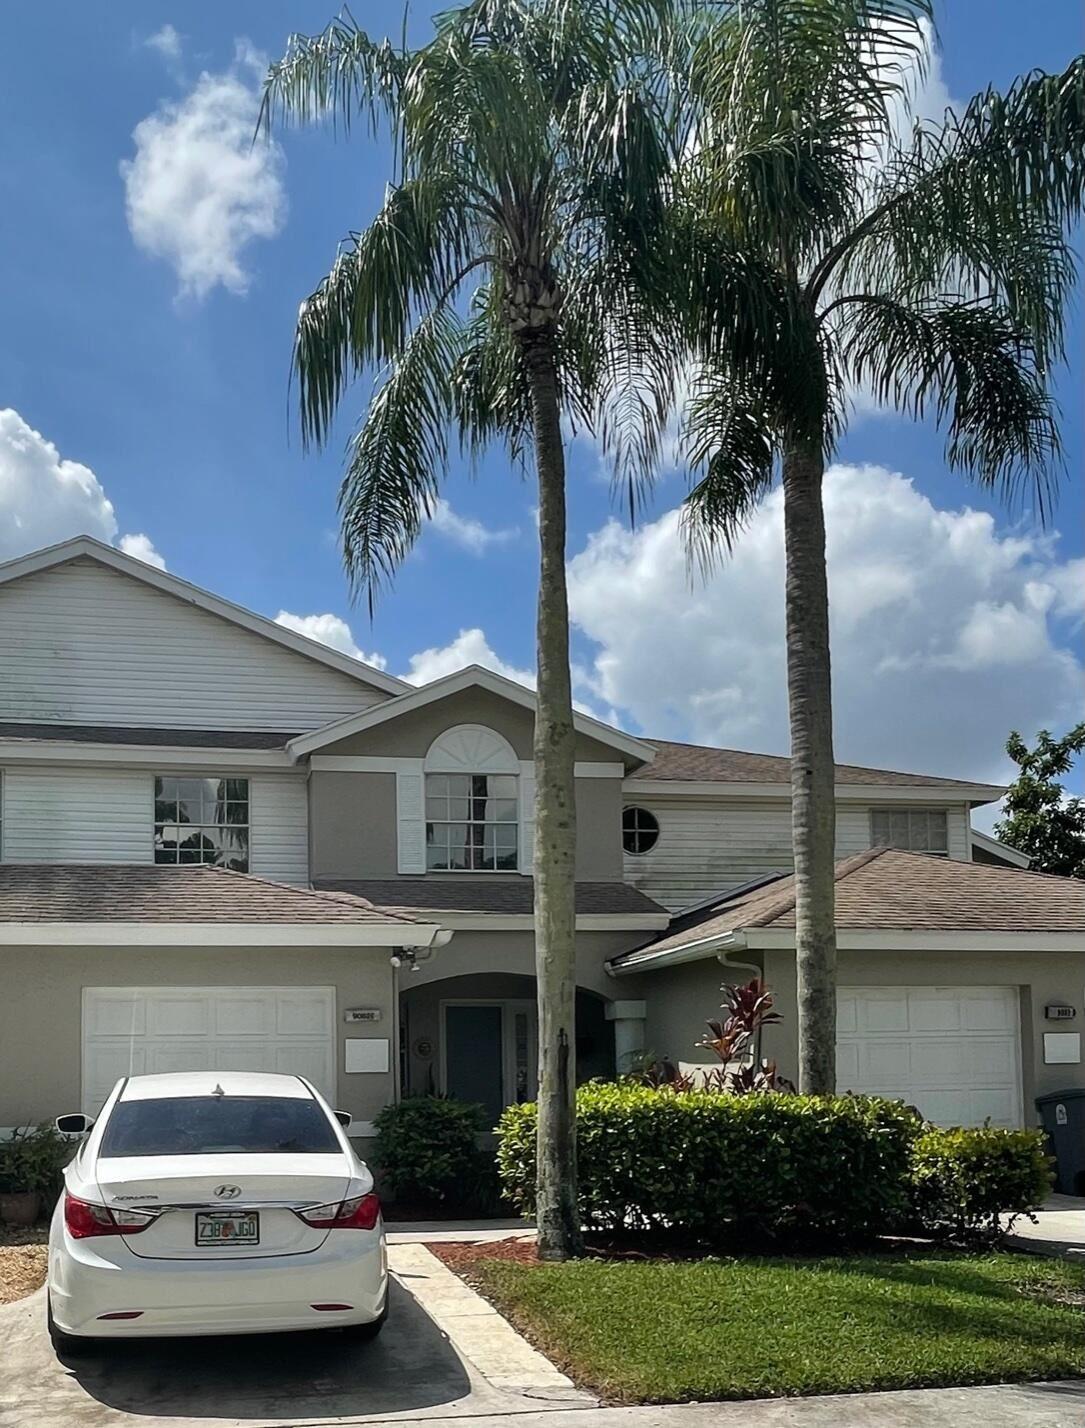 9082 Boca Gardens Parkway #C, Boca Raton, FL 33496 - MLS#: RX-10744073